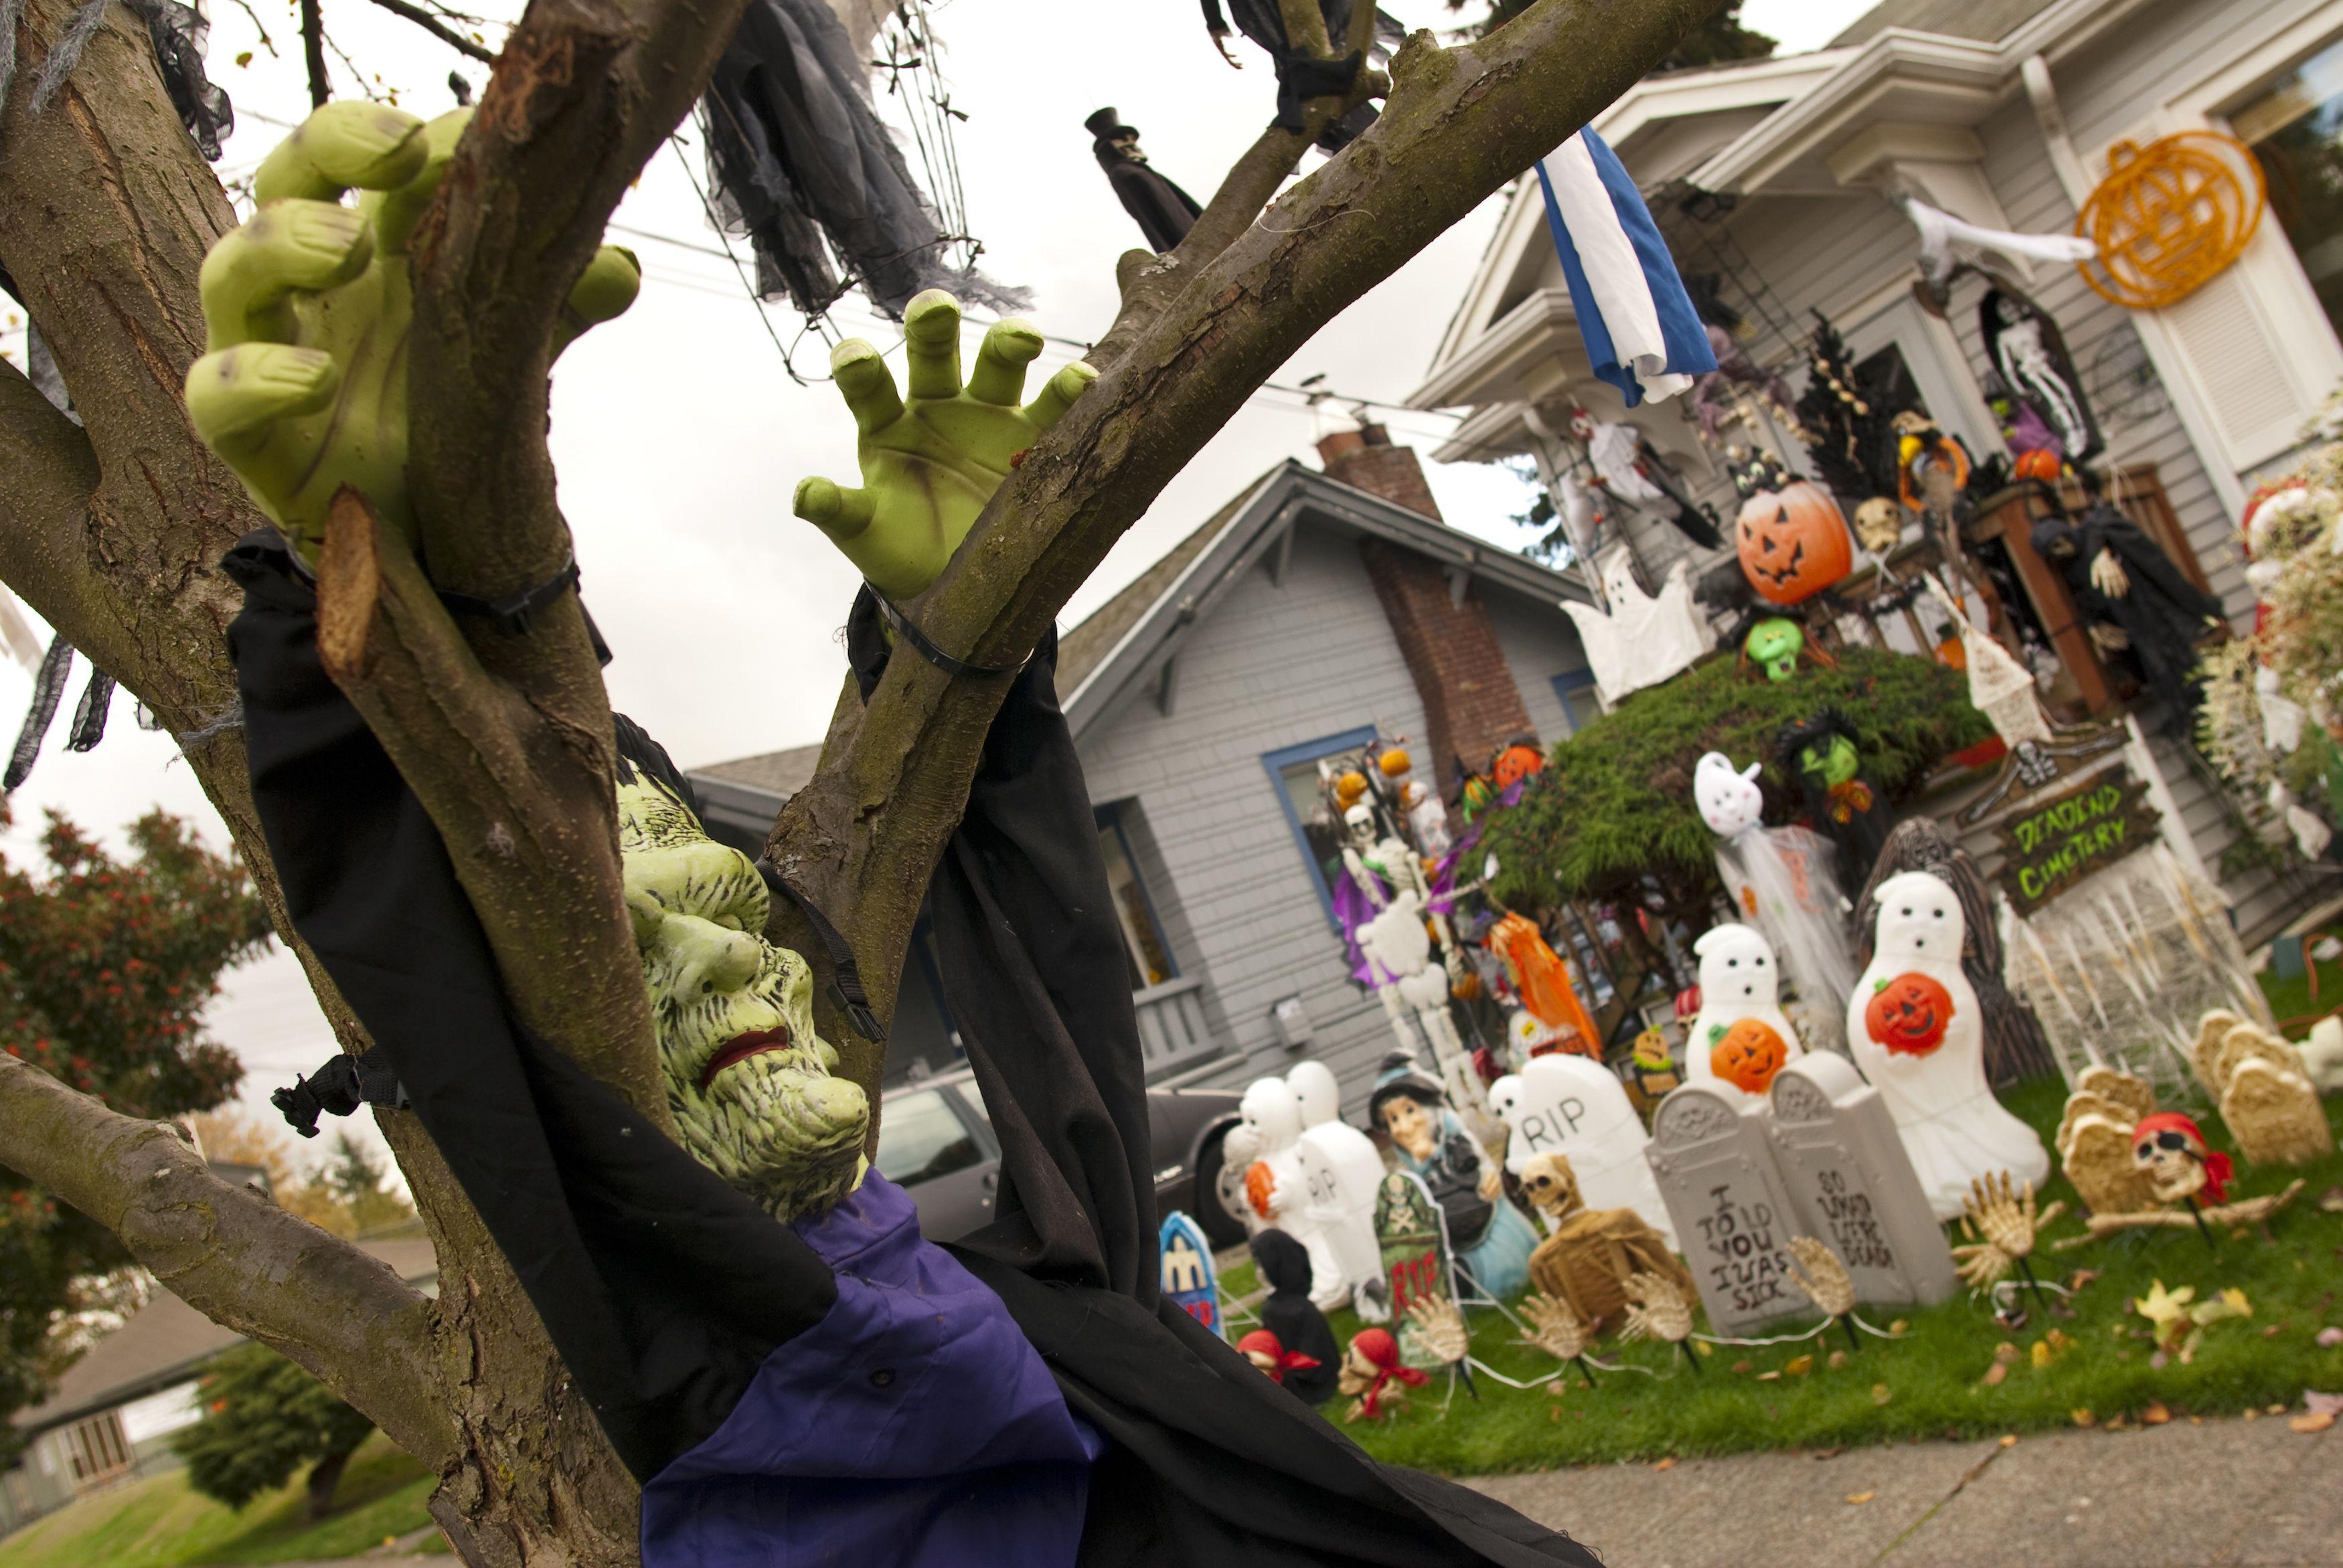 10 Best Outdoor Halloween Decorations Porch Decor Ideas For Halloween